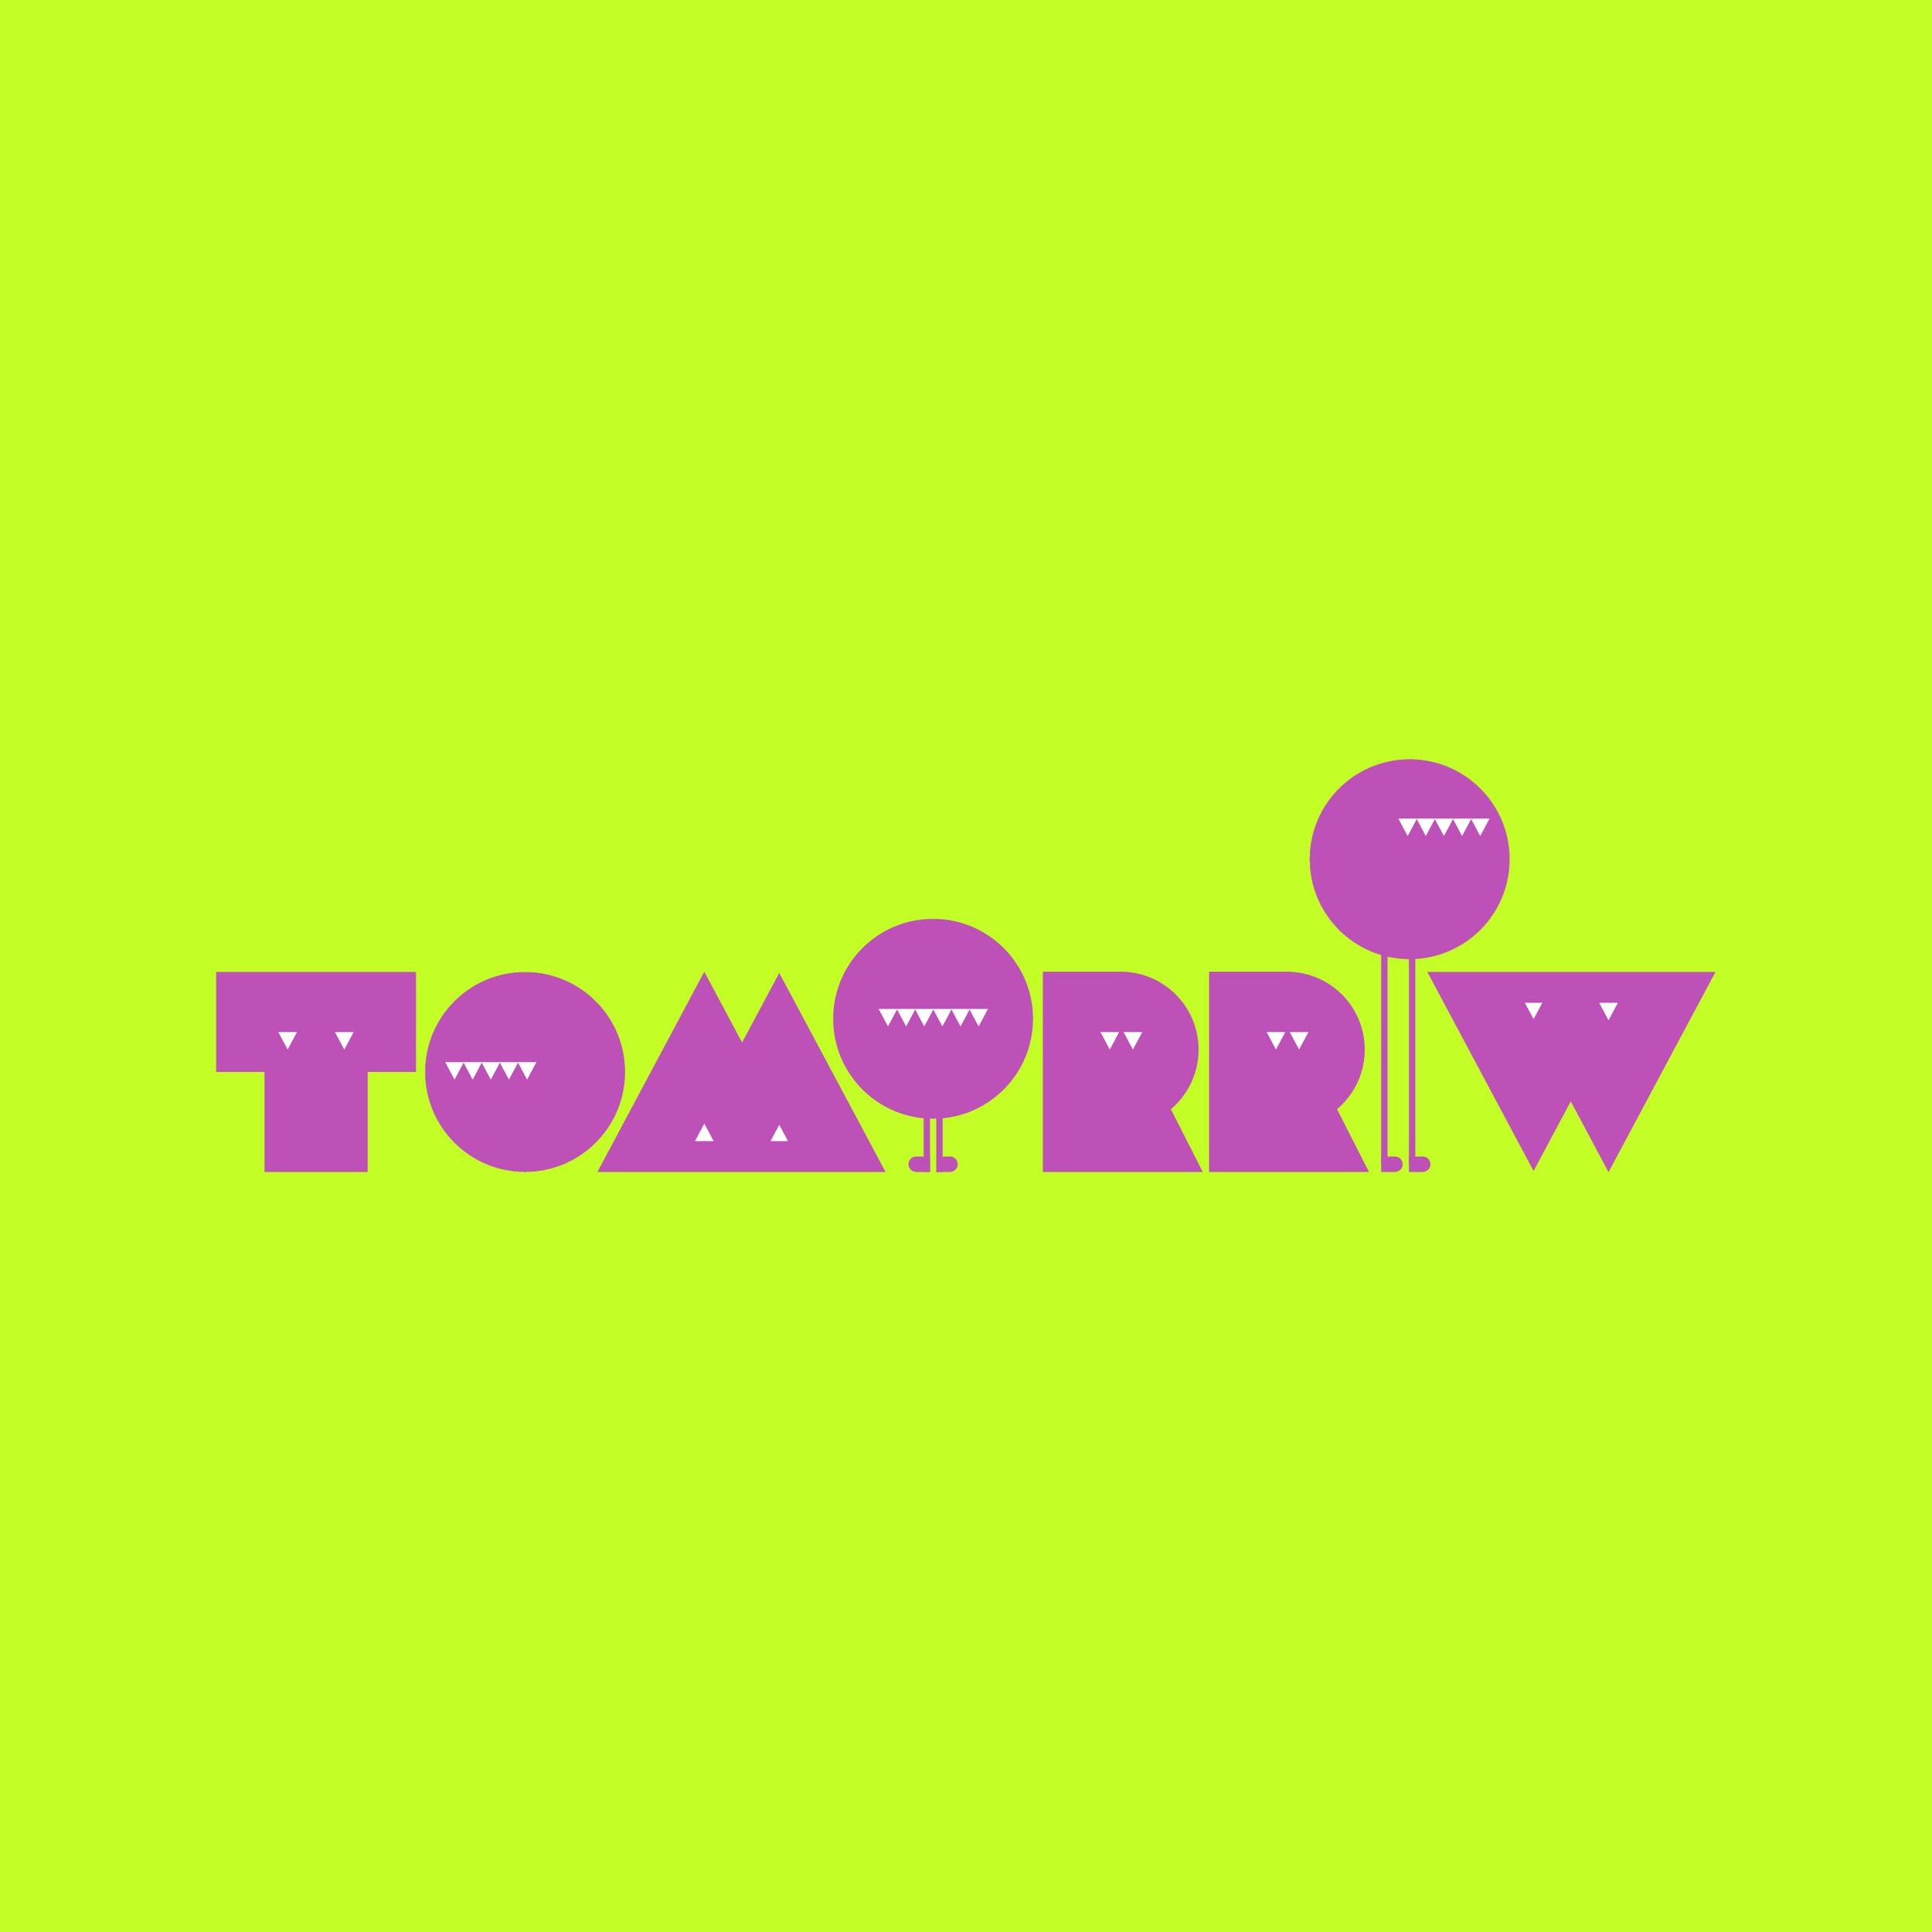 NickToons_Tomorrow_Justin-Harder.png